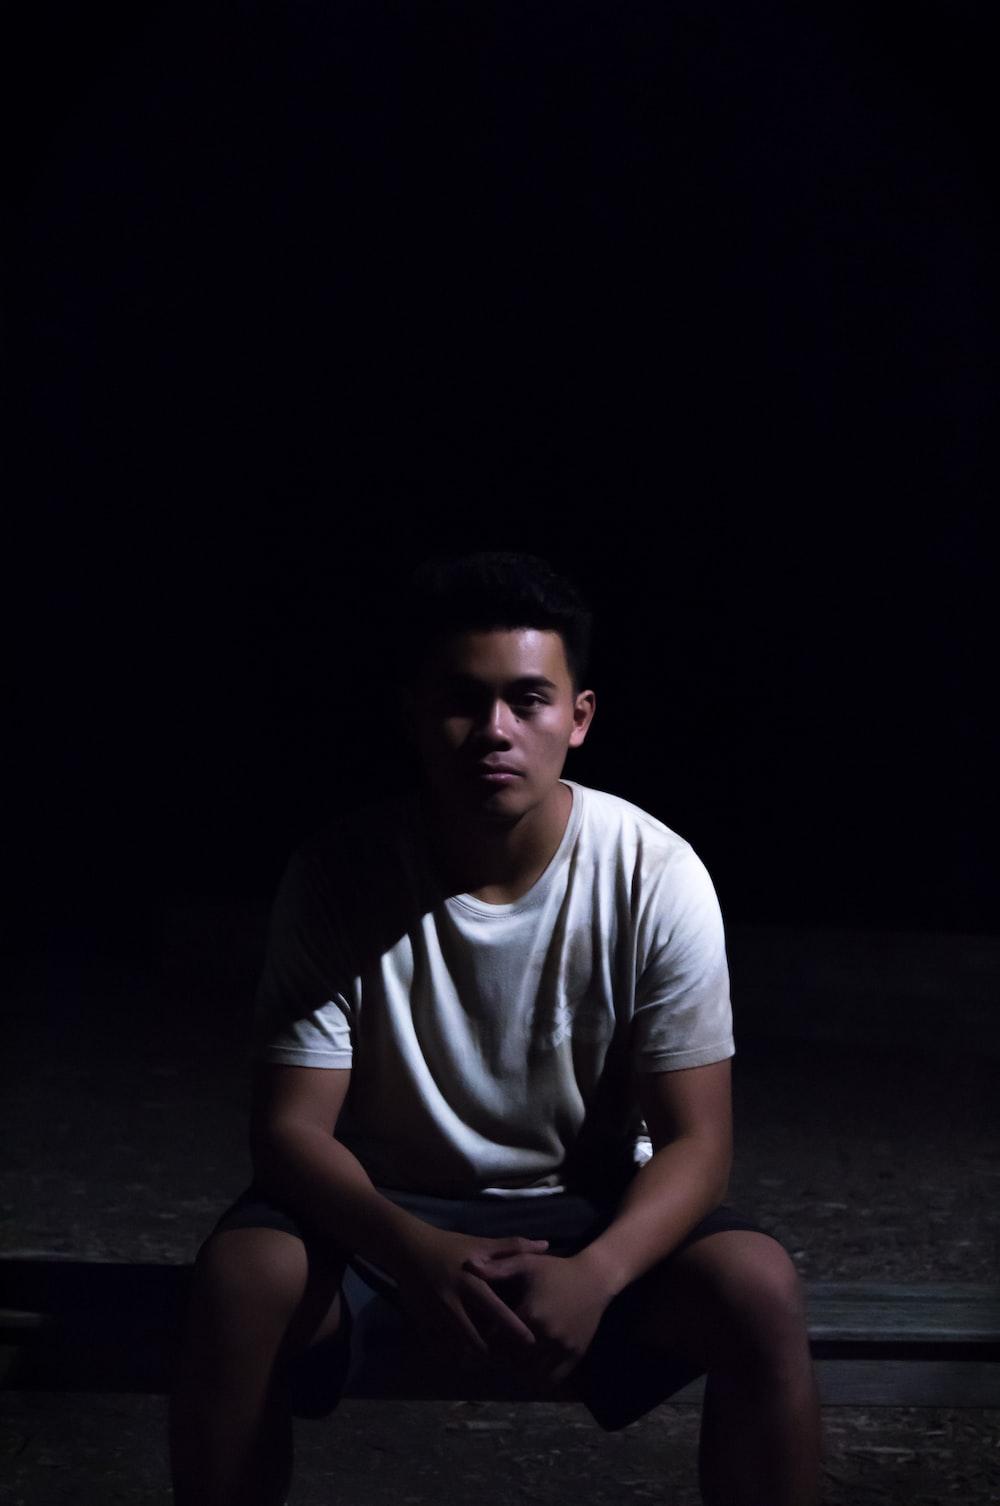 man sitting on ground with black background